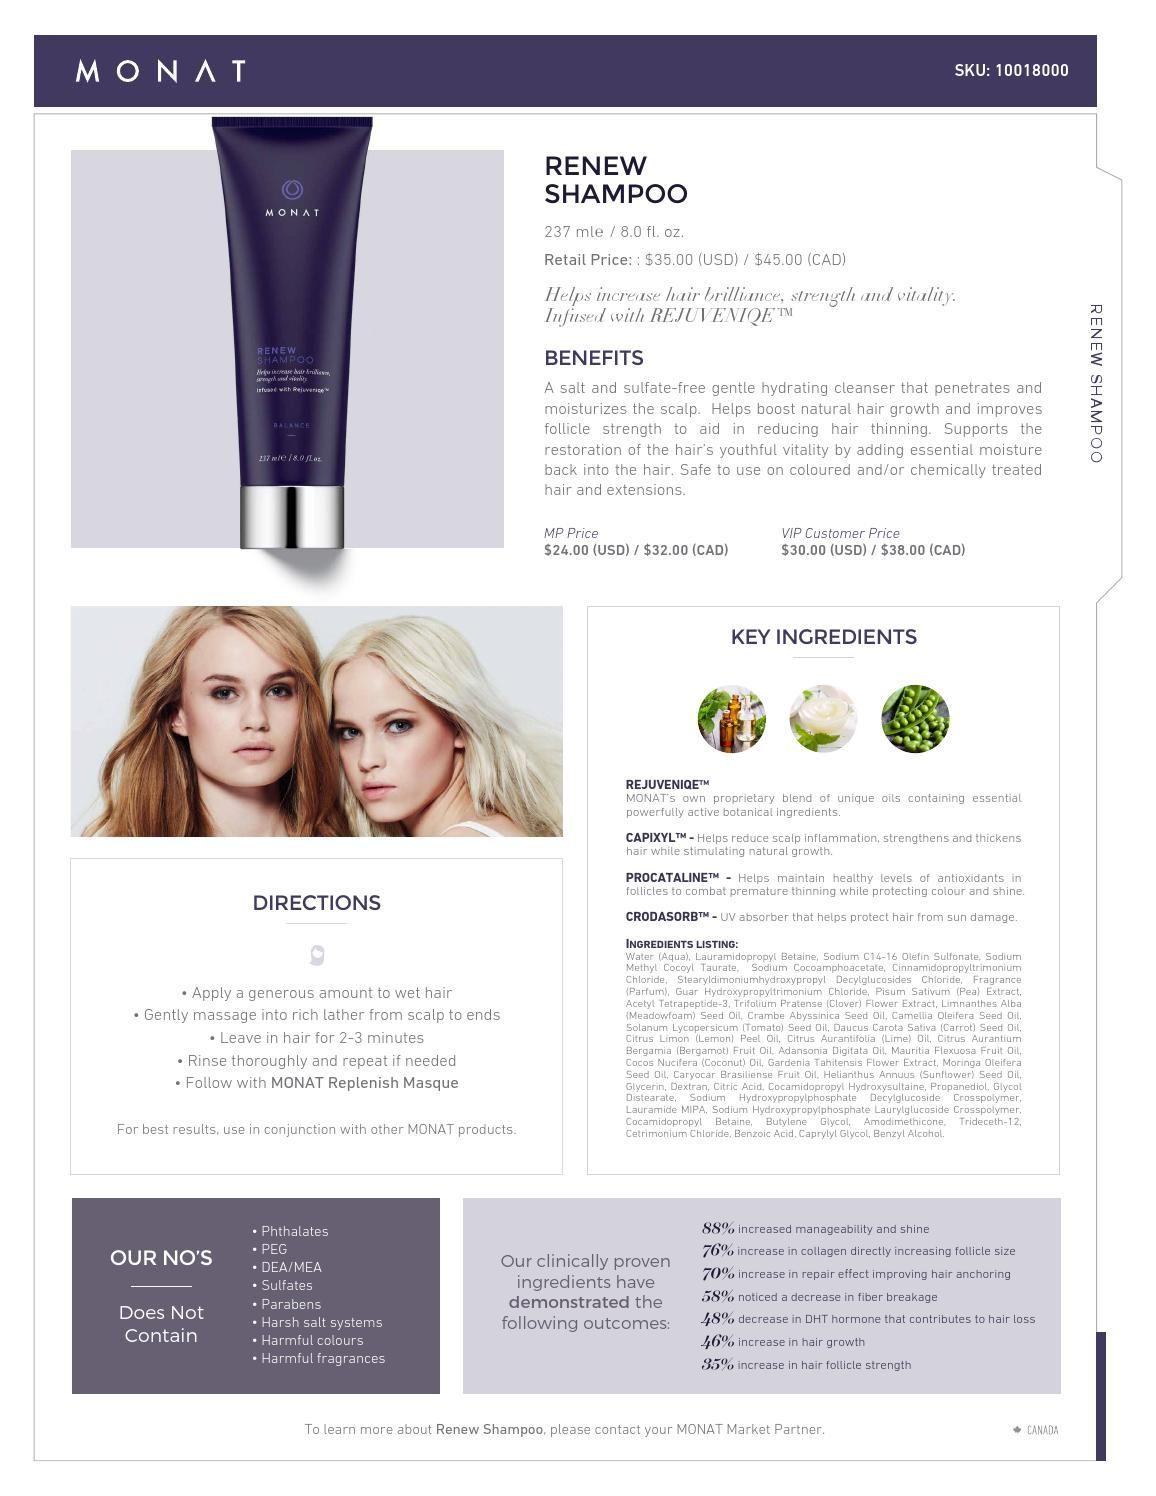 What Ingredient In Monat Causes Hair Loss